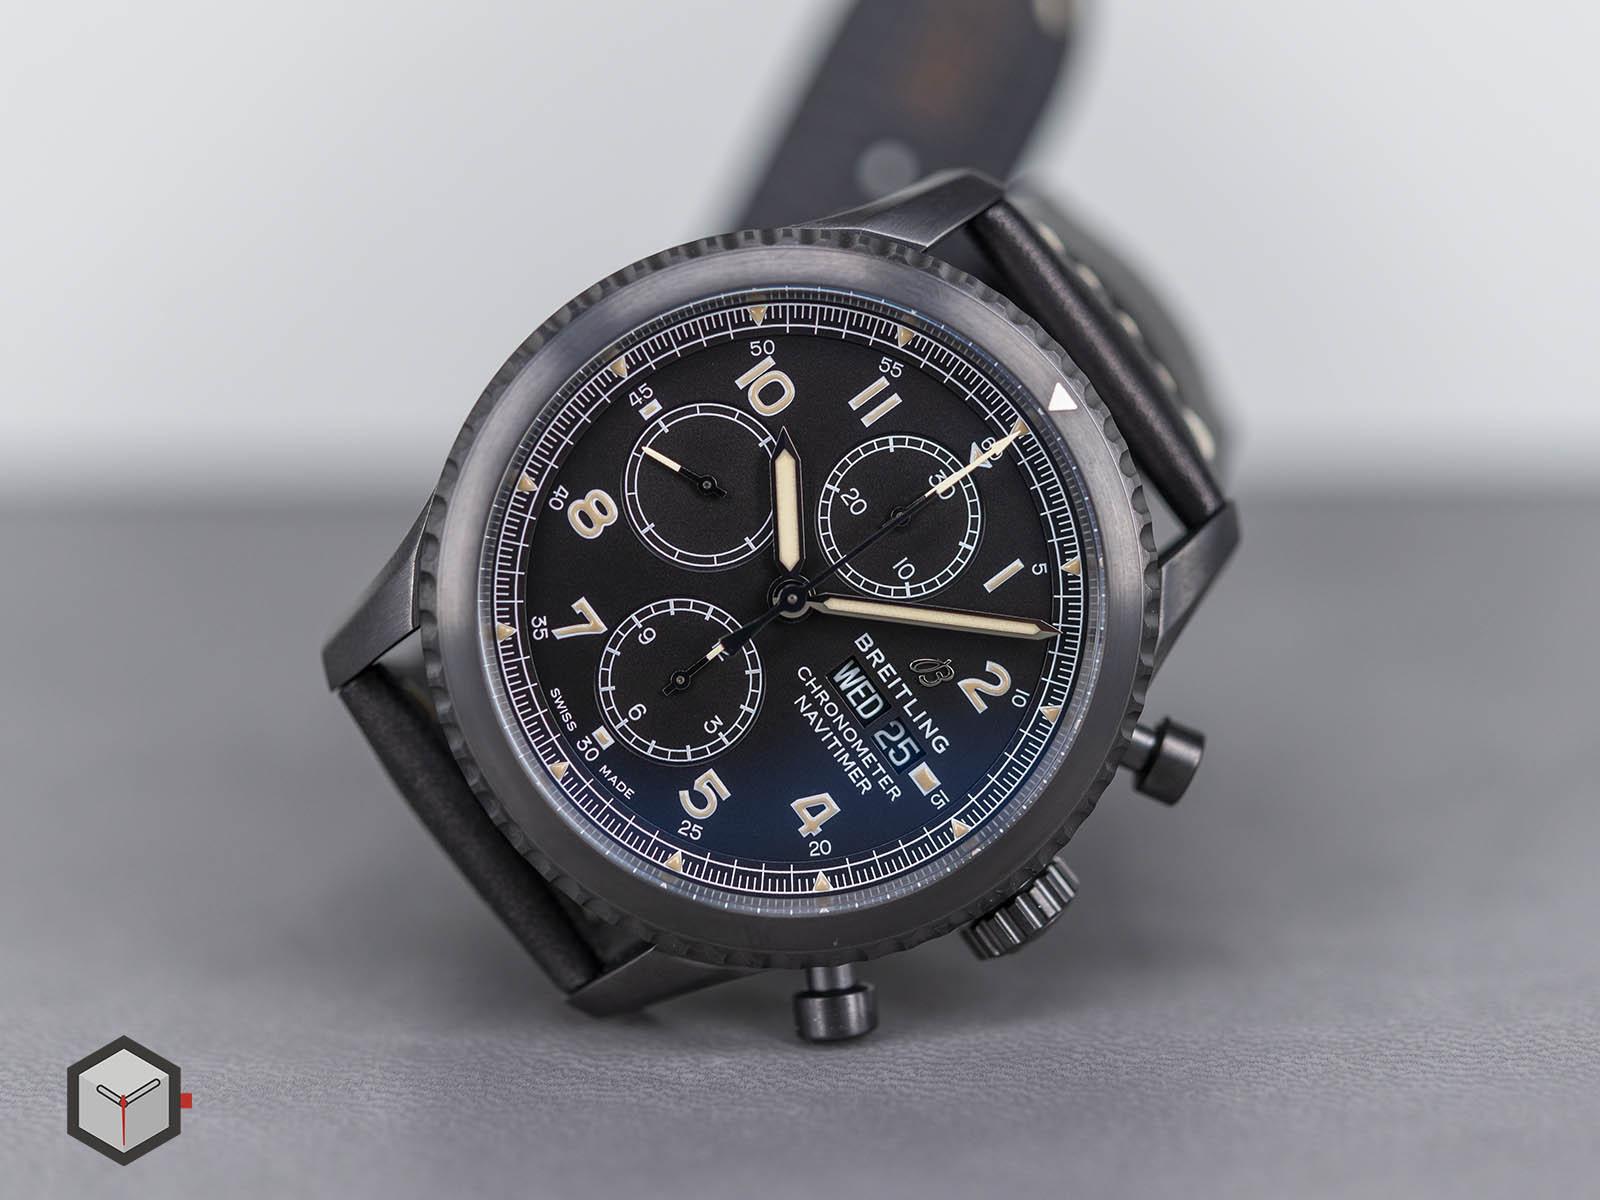 m13314101b1x1-breitling-navitimer-8-chronograph-43-blacksteel-3.jpg